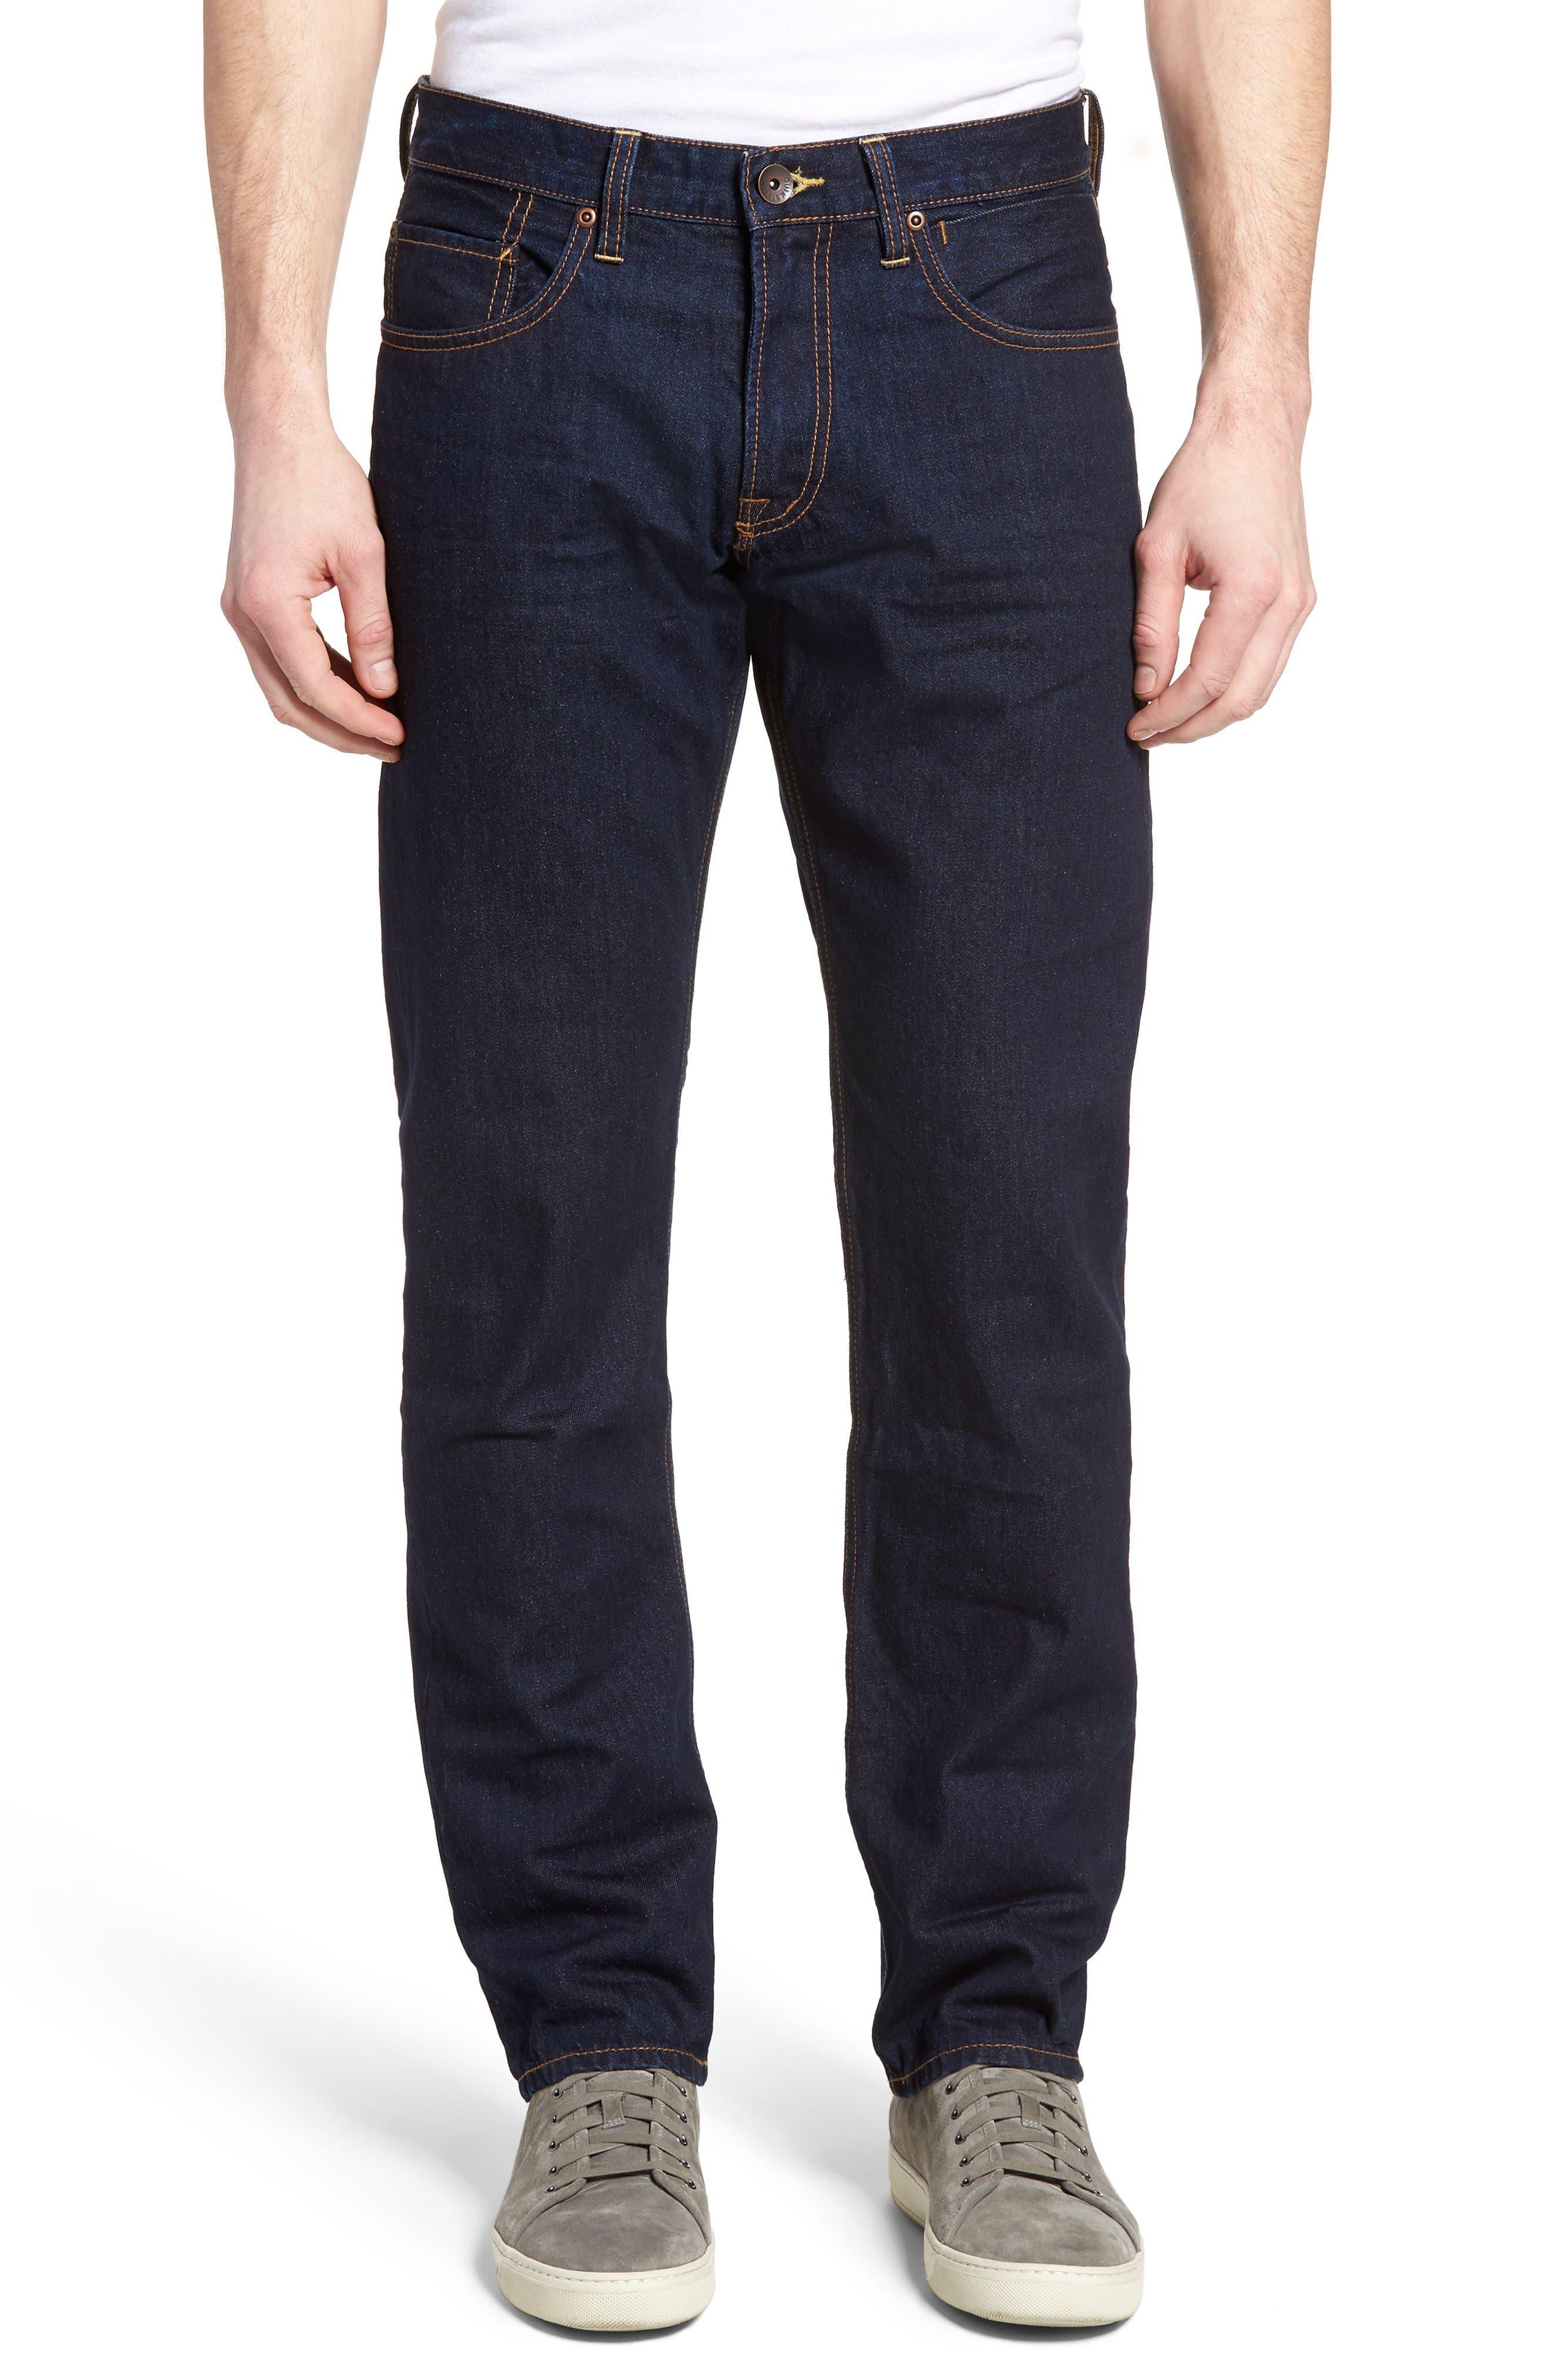 Quiksilver Sequel Straight Leg Jeans (Rinse)